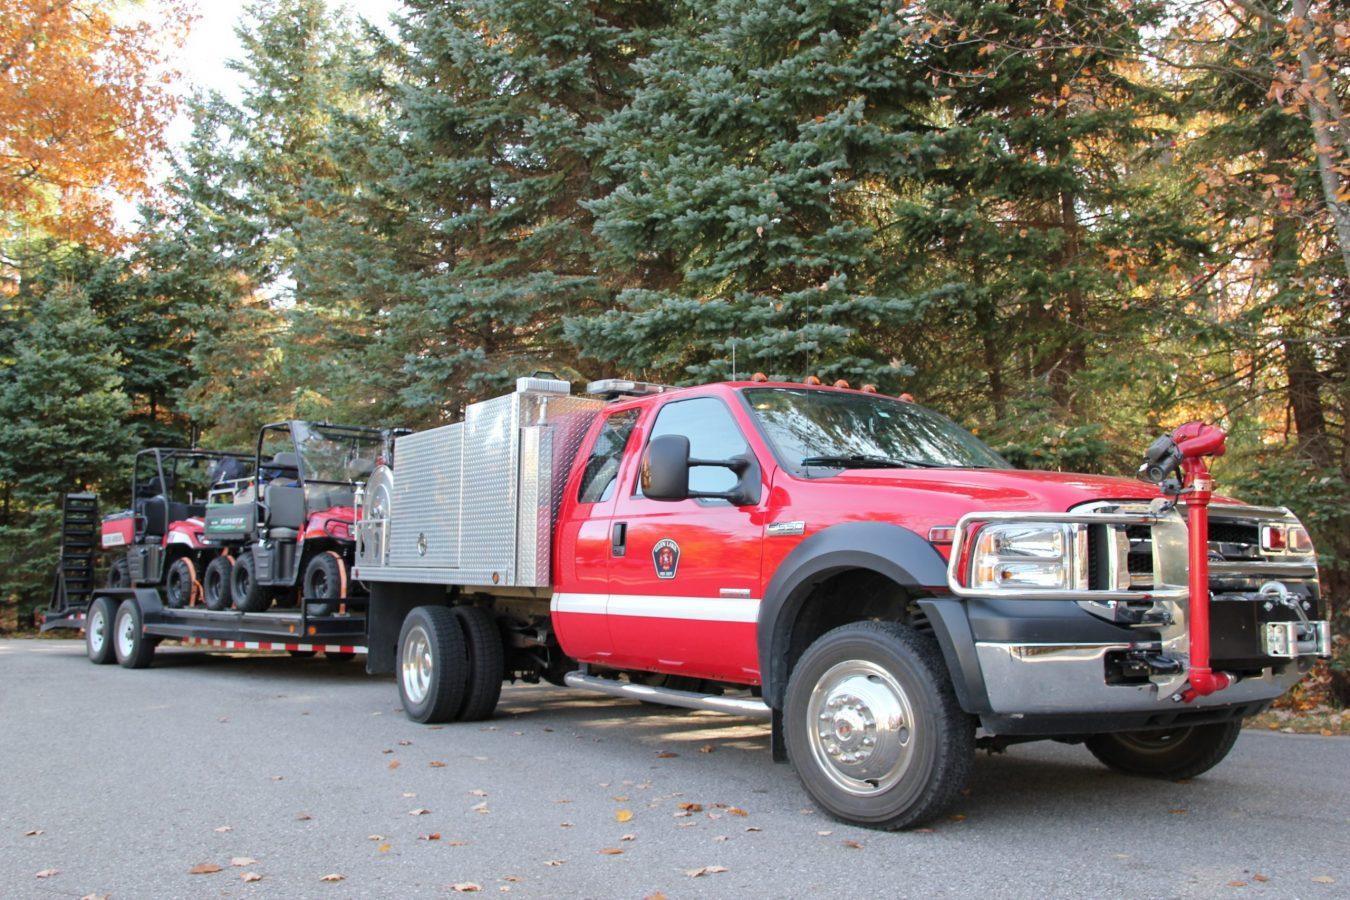 glfd truck 381 pulling atv's